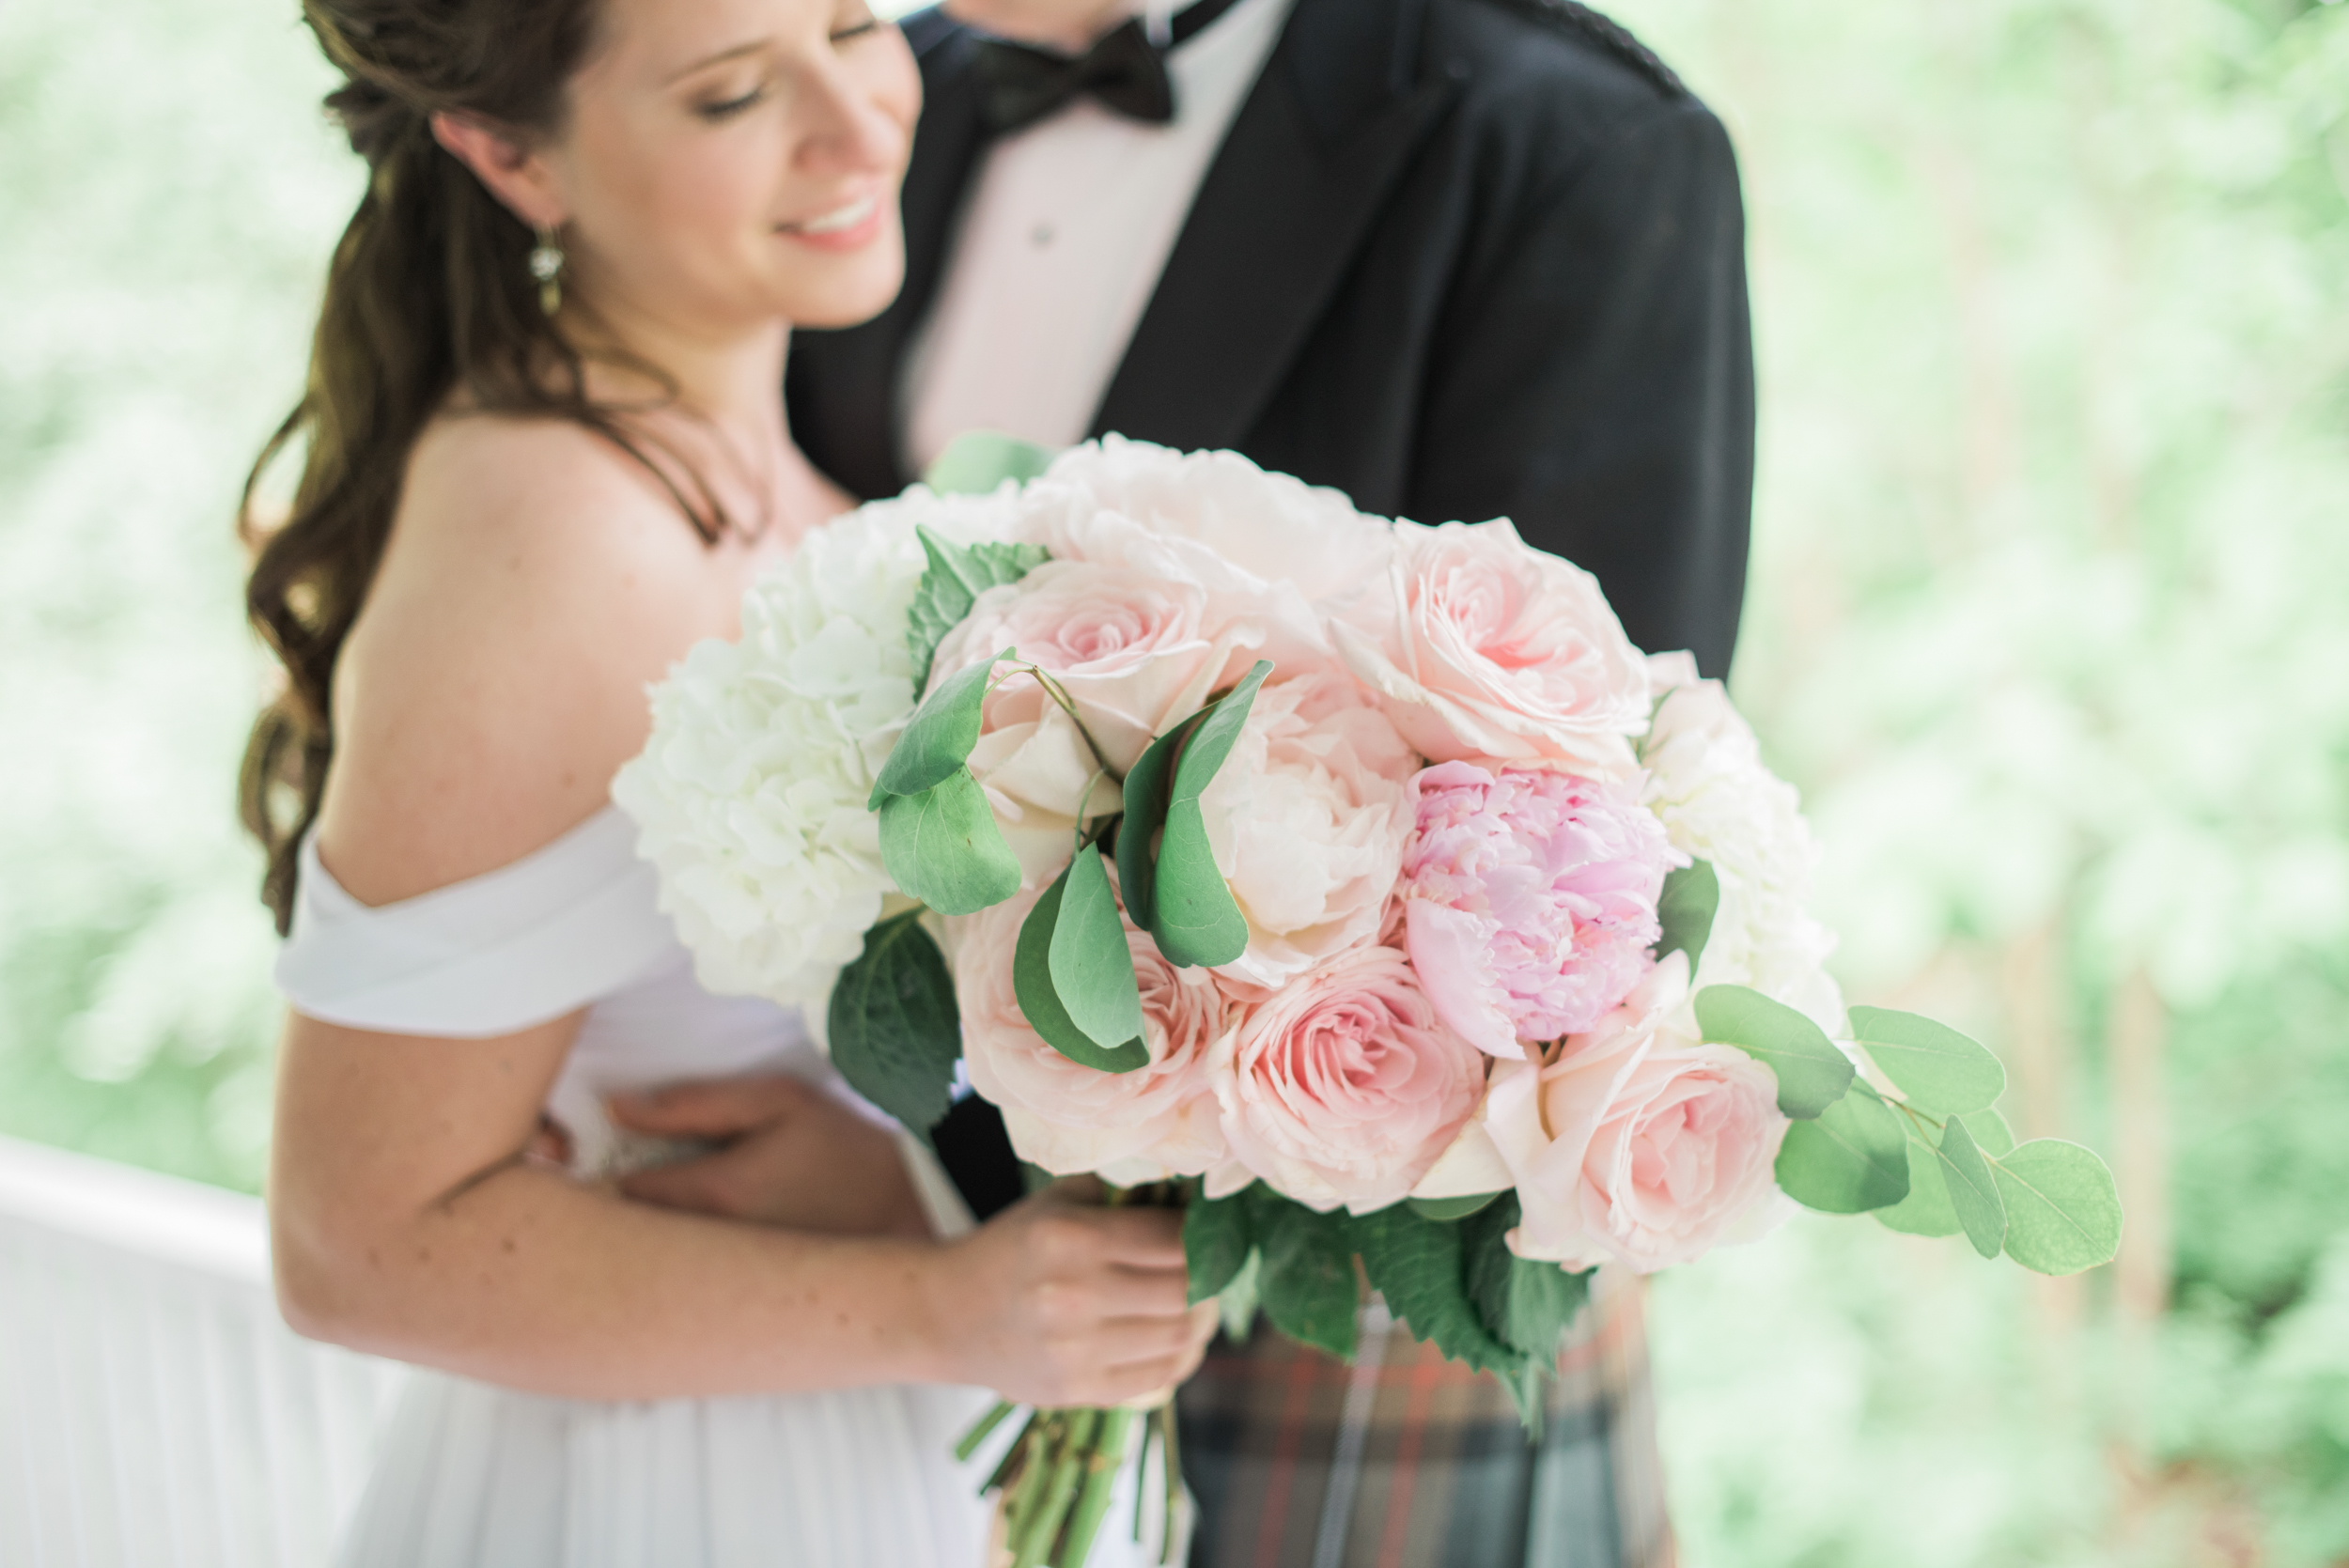 Stockbridge area wedding photographers